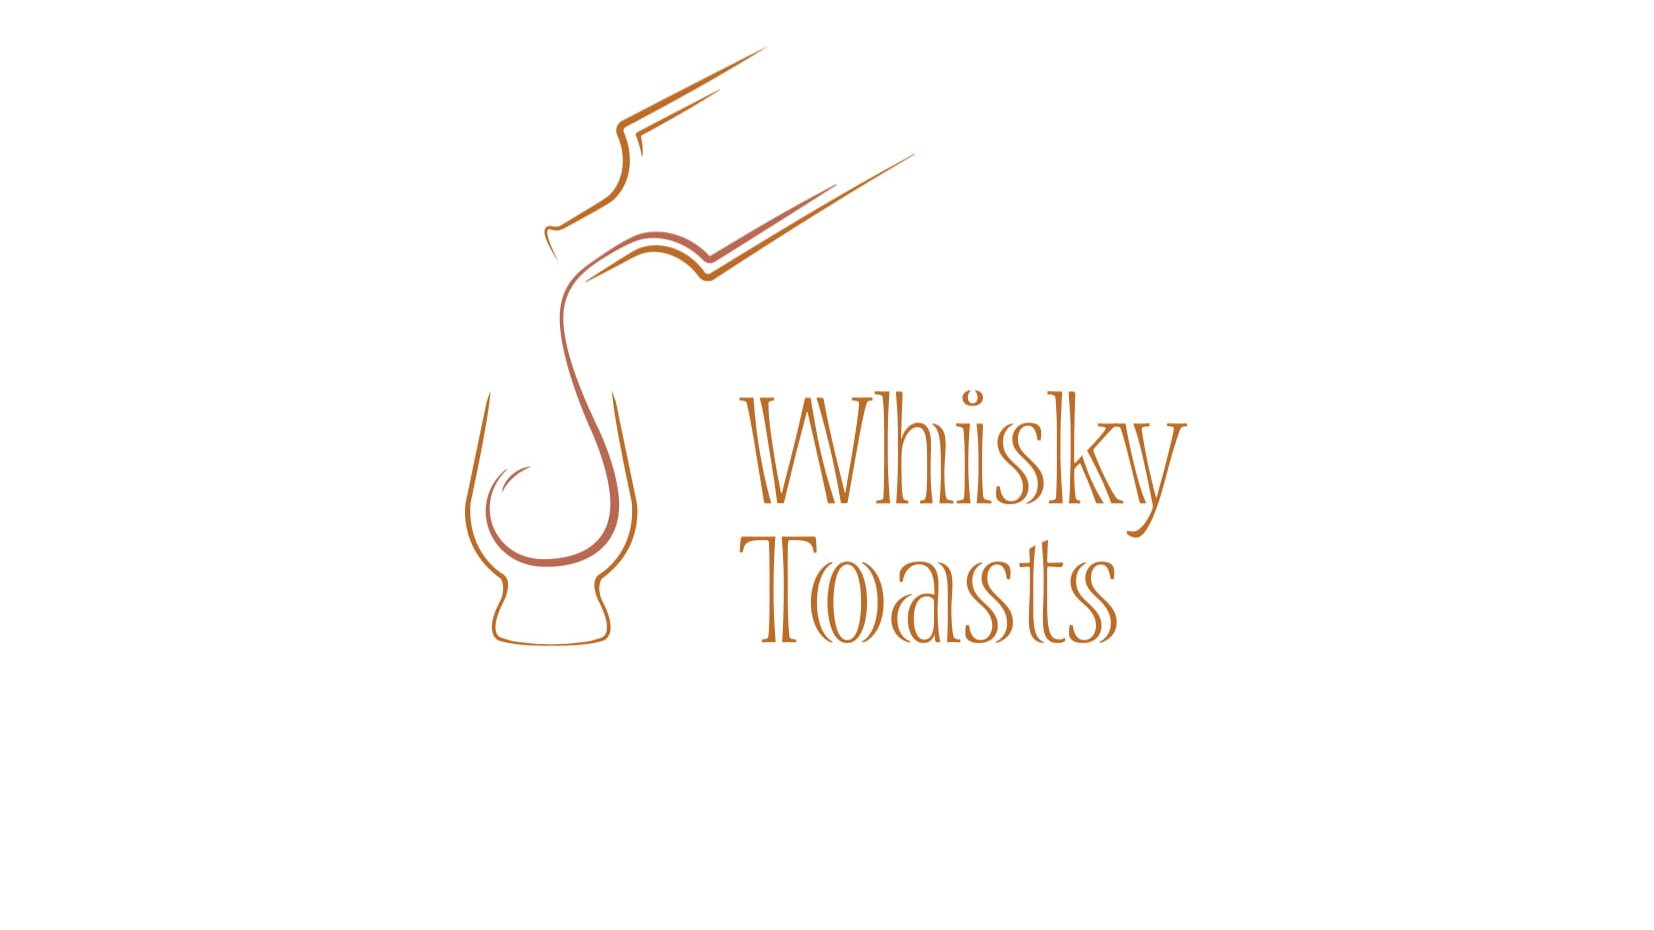 Whisky Regions Tasting